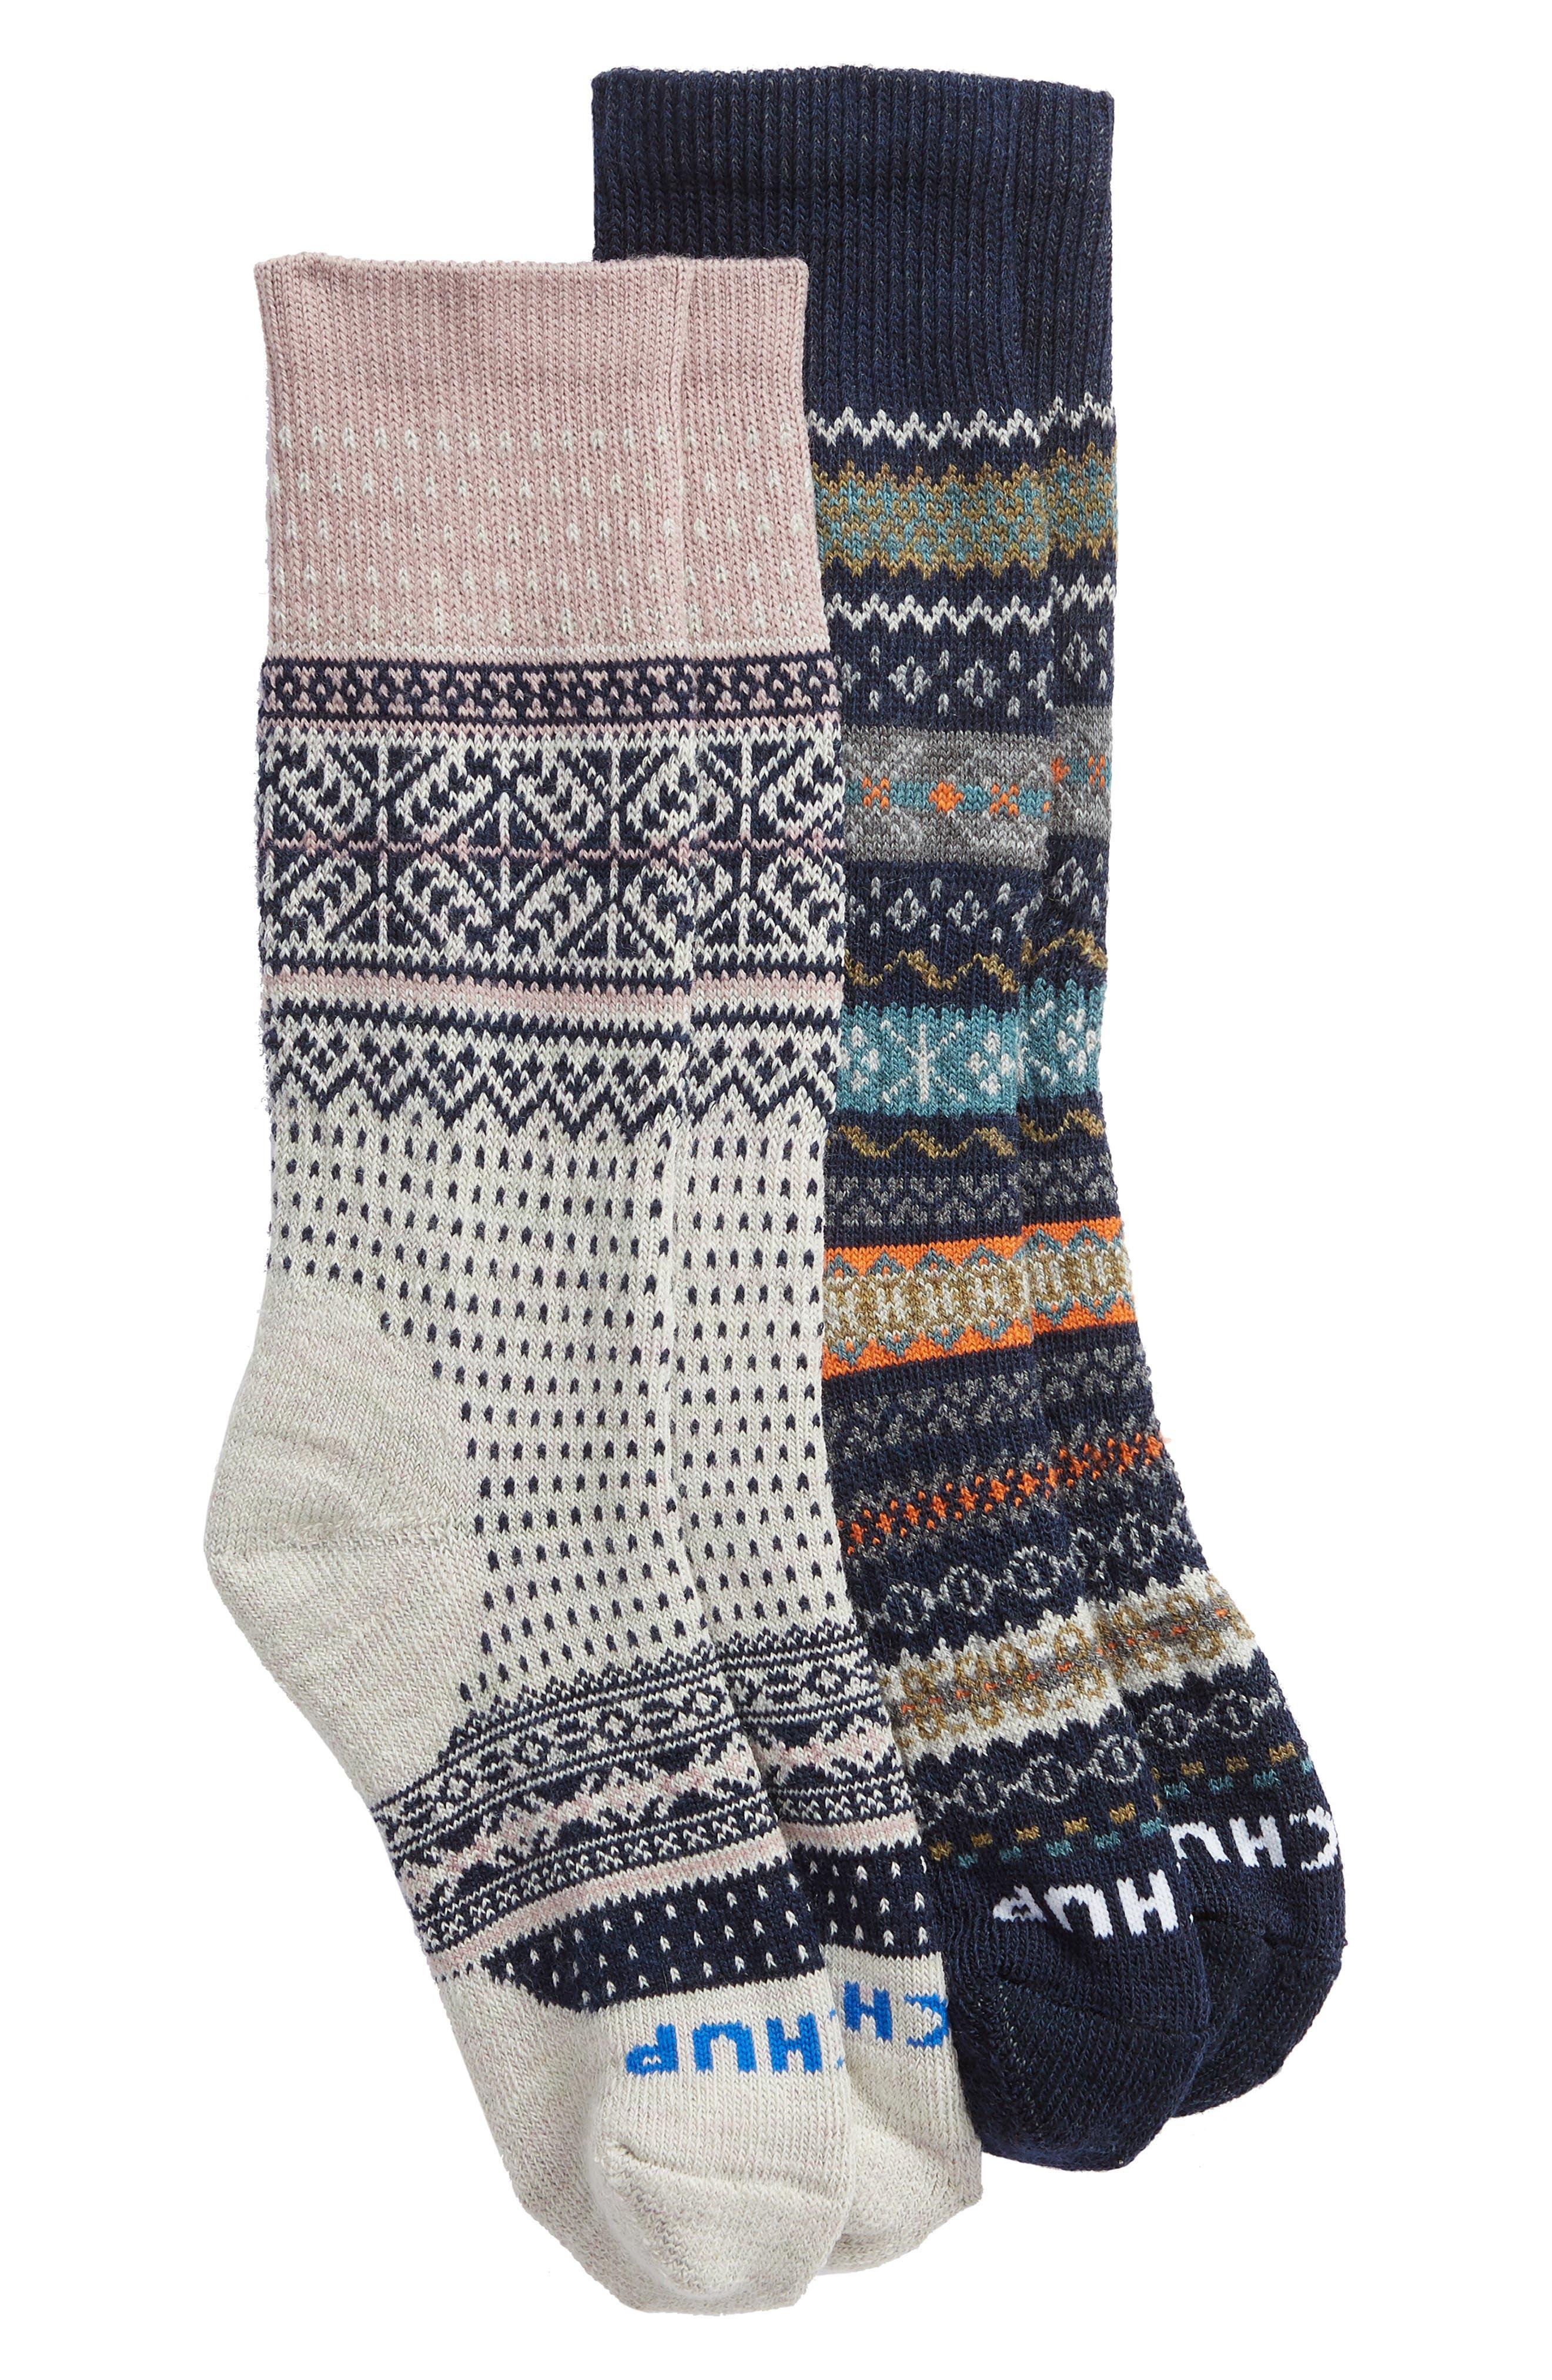 SMARTWOOL,                             x CHUP 2-Pack Merino Wool Socks,                             Main thumbnail 1, color,                             410